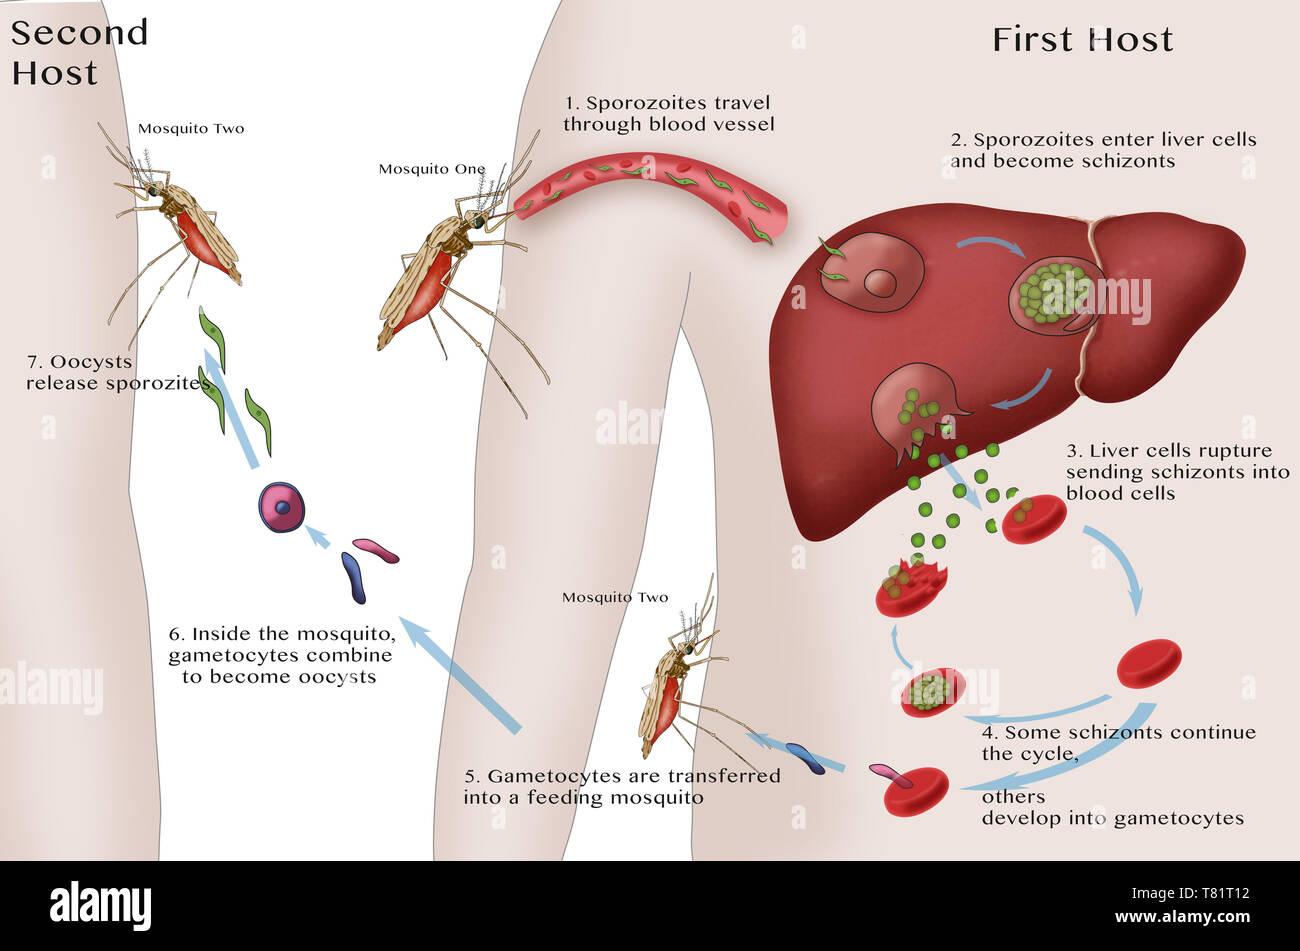 Malaria Cycle, Illustration - Stock Image